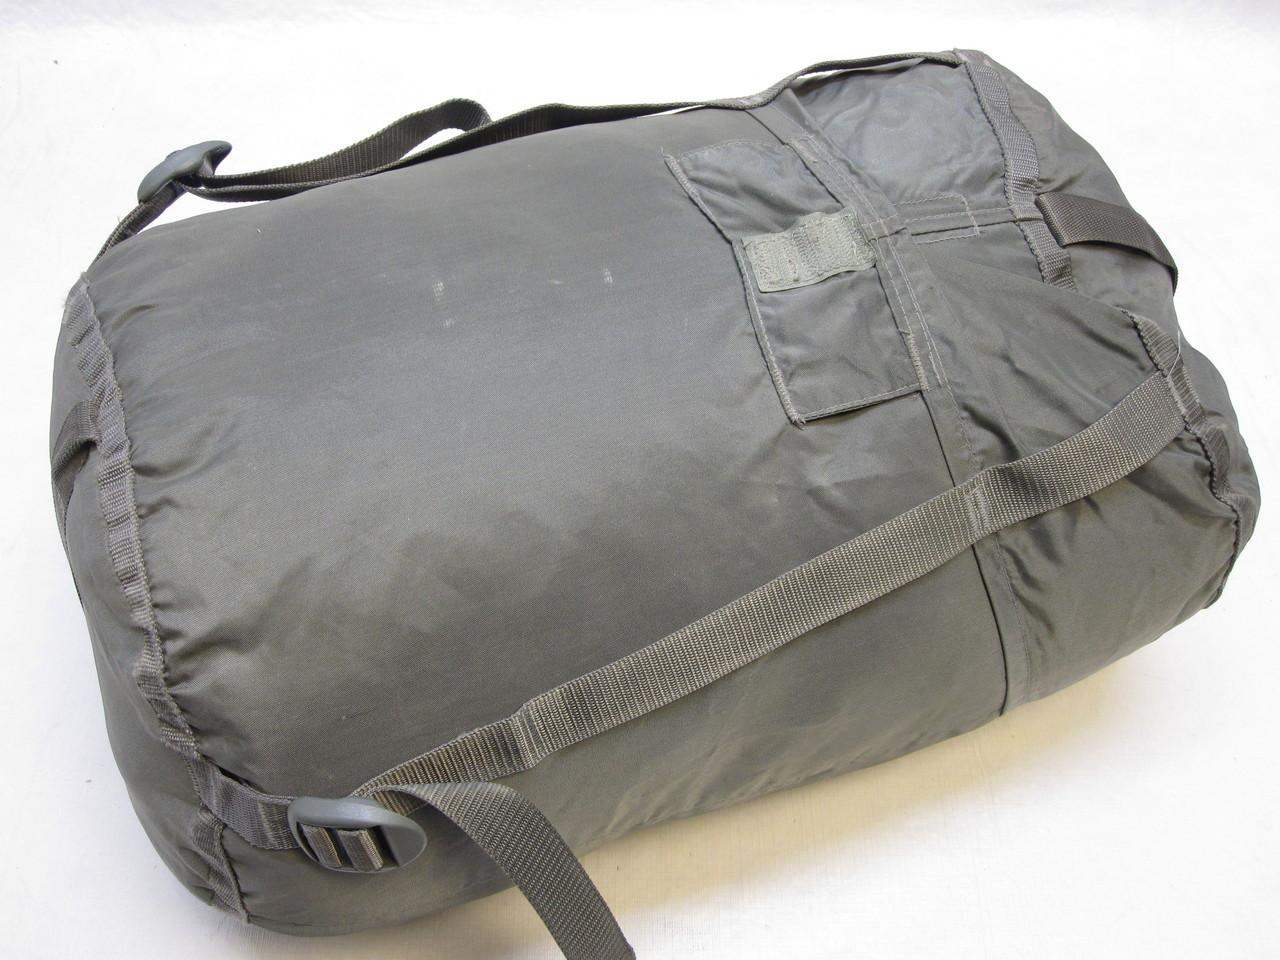 ARMY SLEEP SYSTEM SMALL COMPRESSION SACK BIVY CARRY BAG FOLIAGE a2